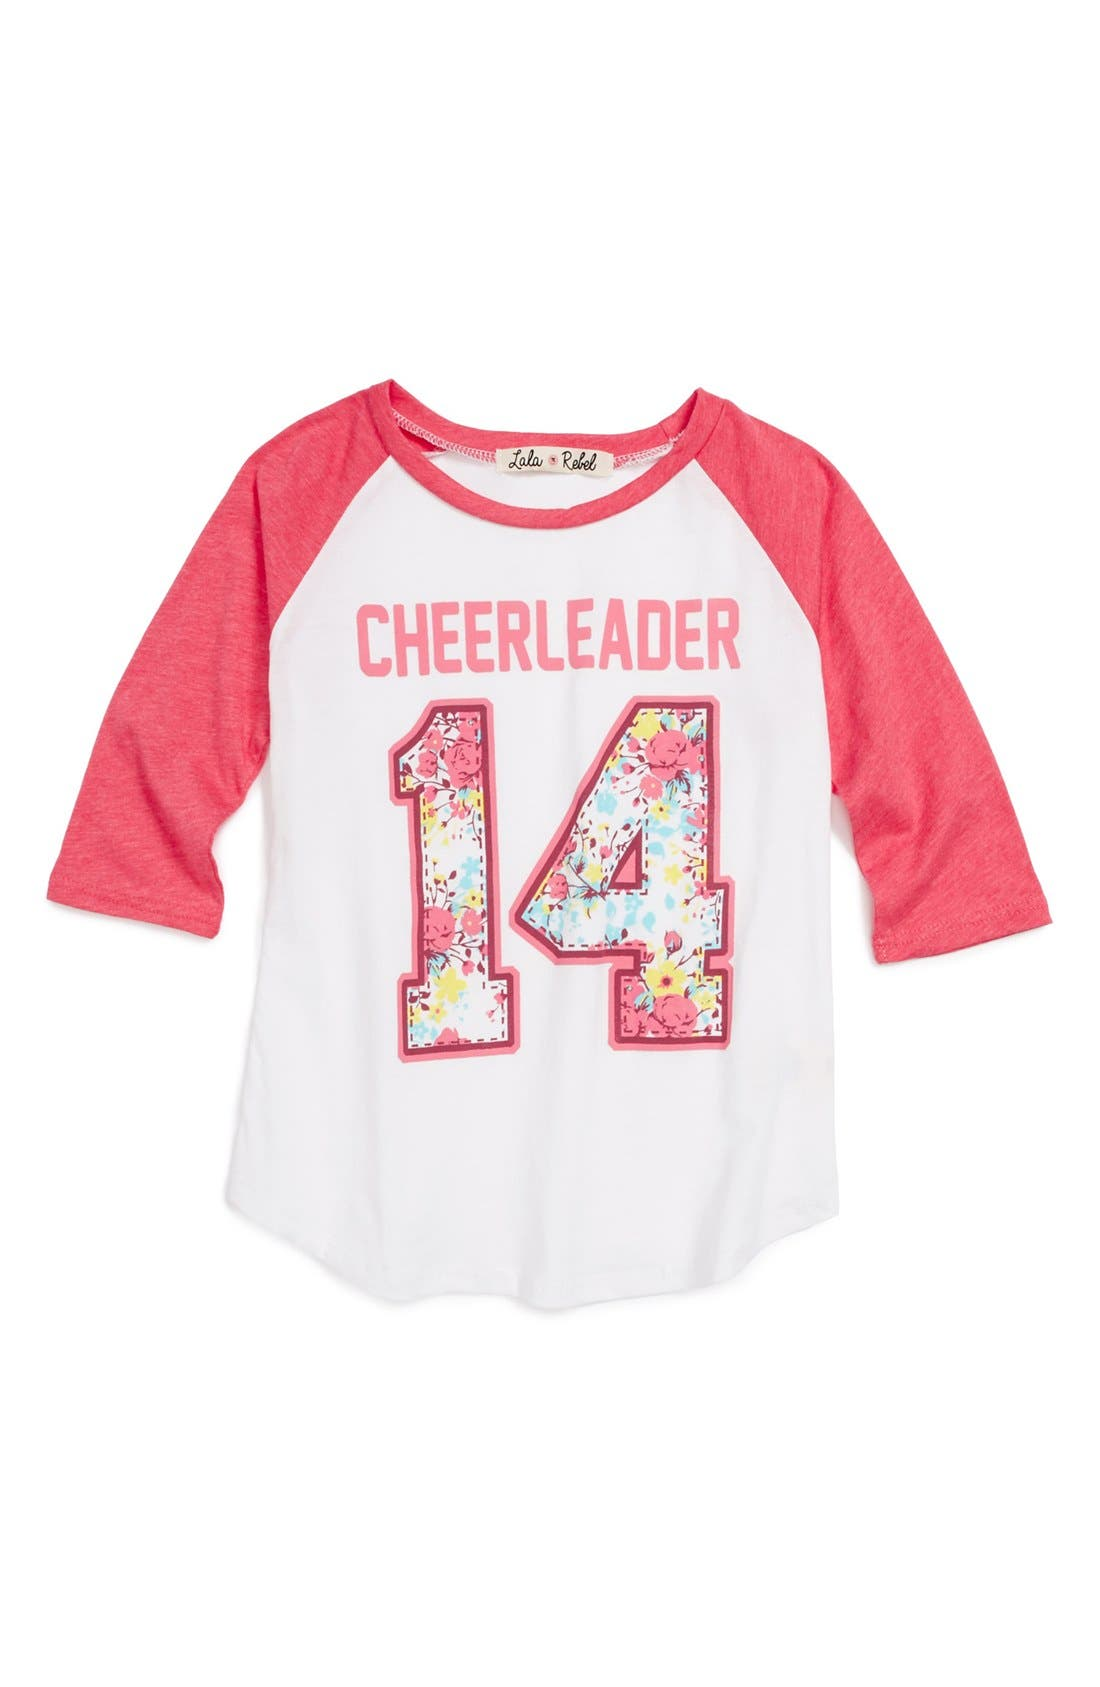 Alternate Image 1 Selected - Lala Rebel 'Cheerleader' Tee (Toddler Girls)